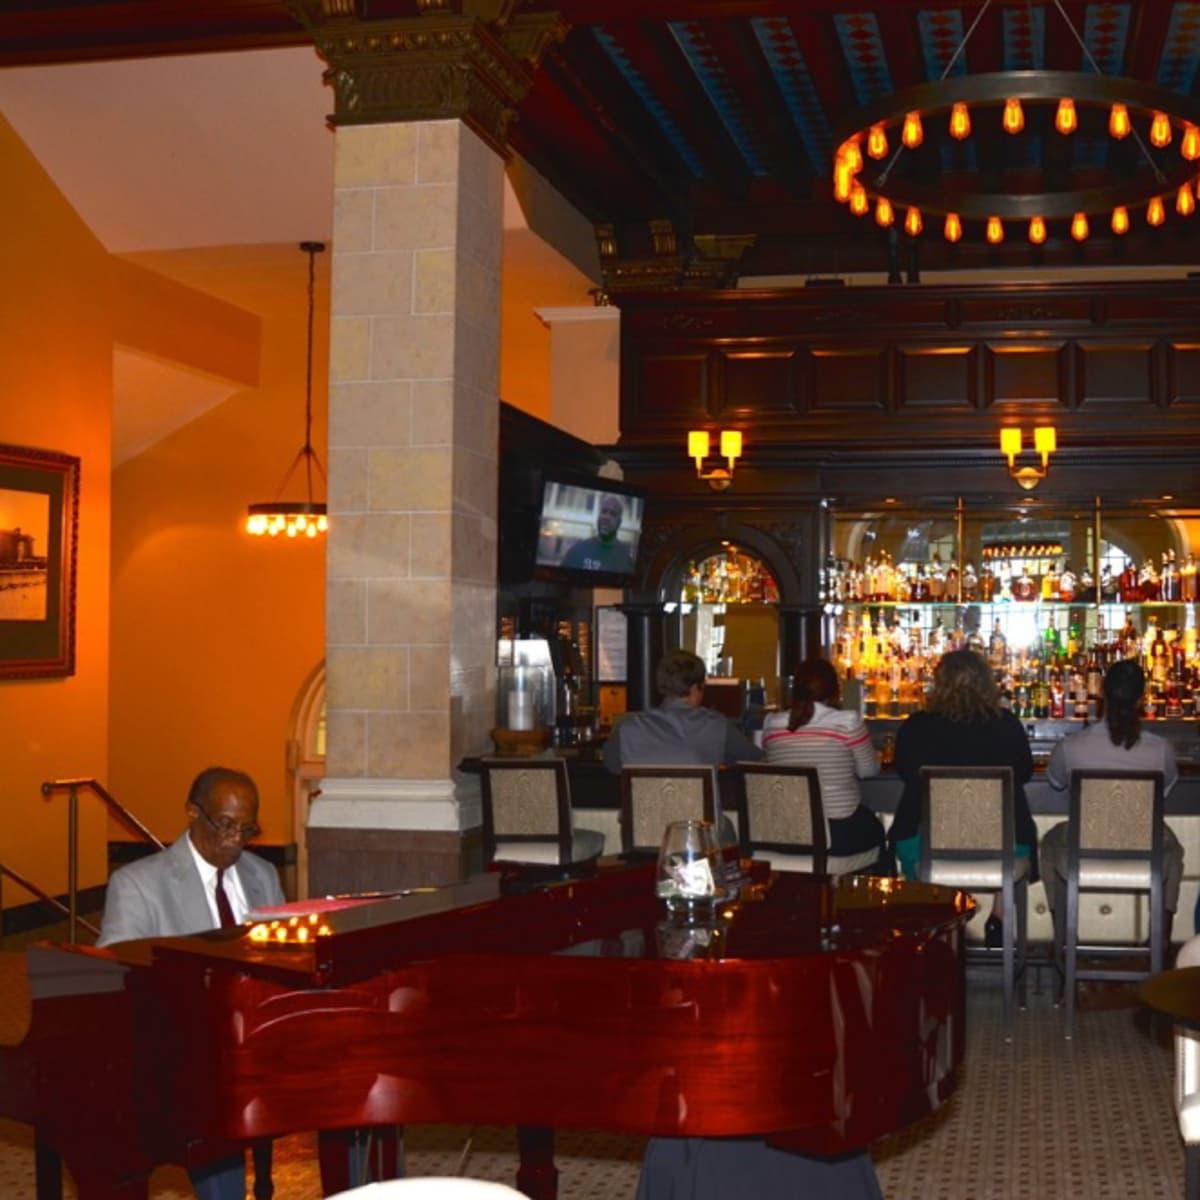 Galveston Galvez Bar and Grill